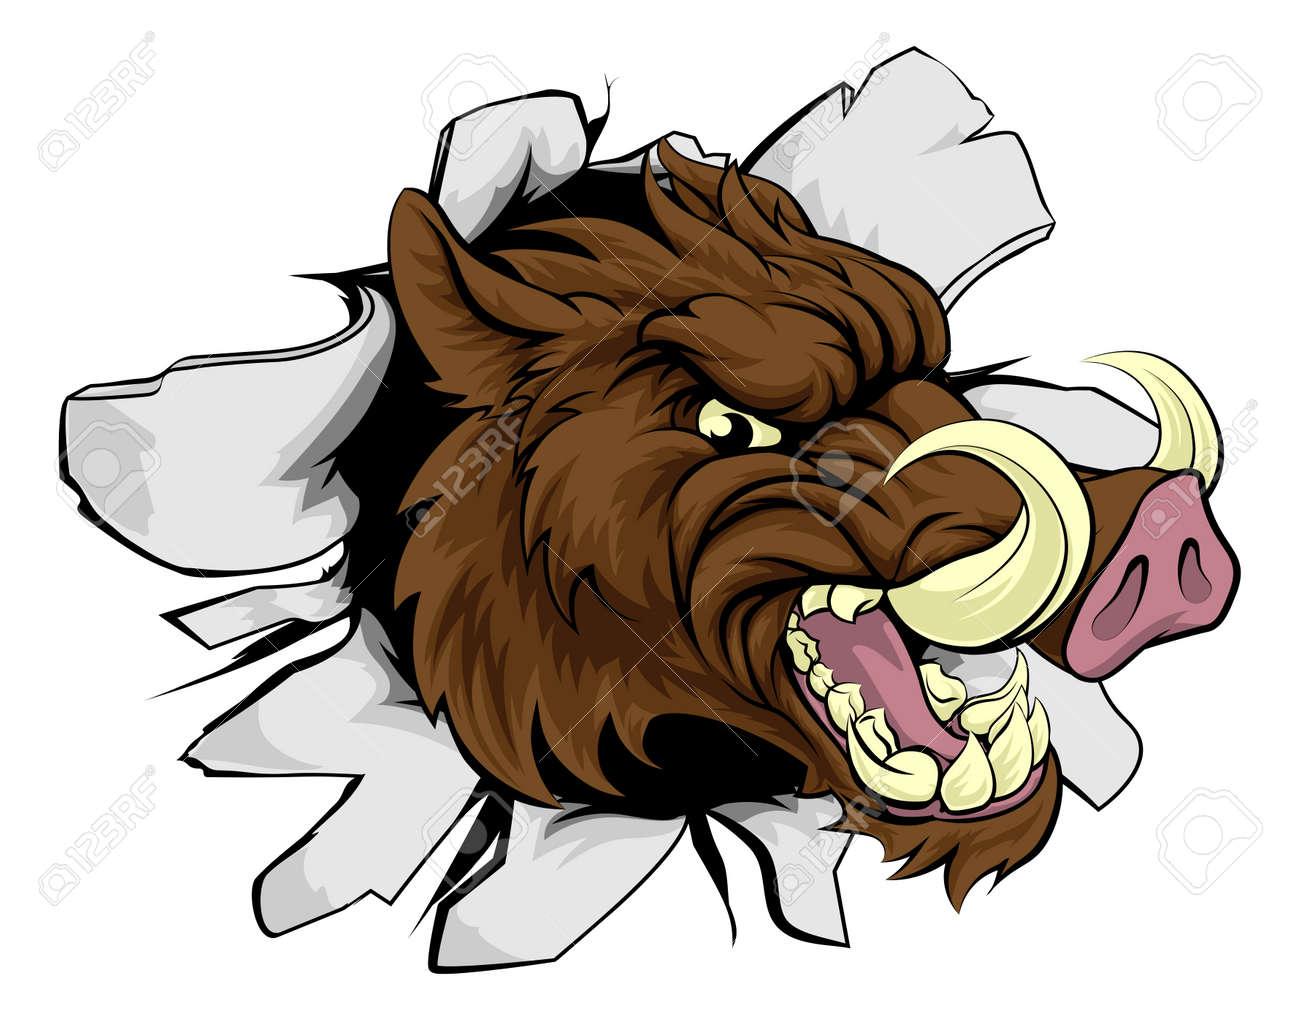 a wild boar or razorback cartoon sports mascot breaking through rh 123rf com wild boar clipart free wild boar animated clipart